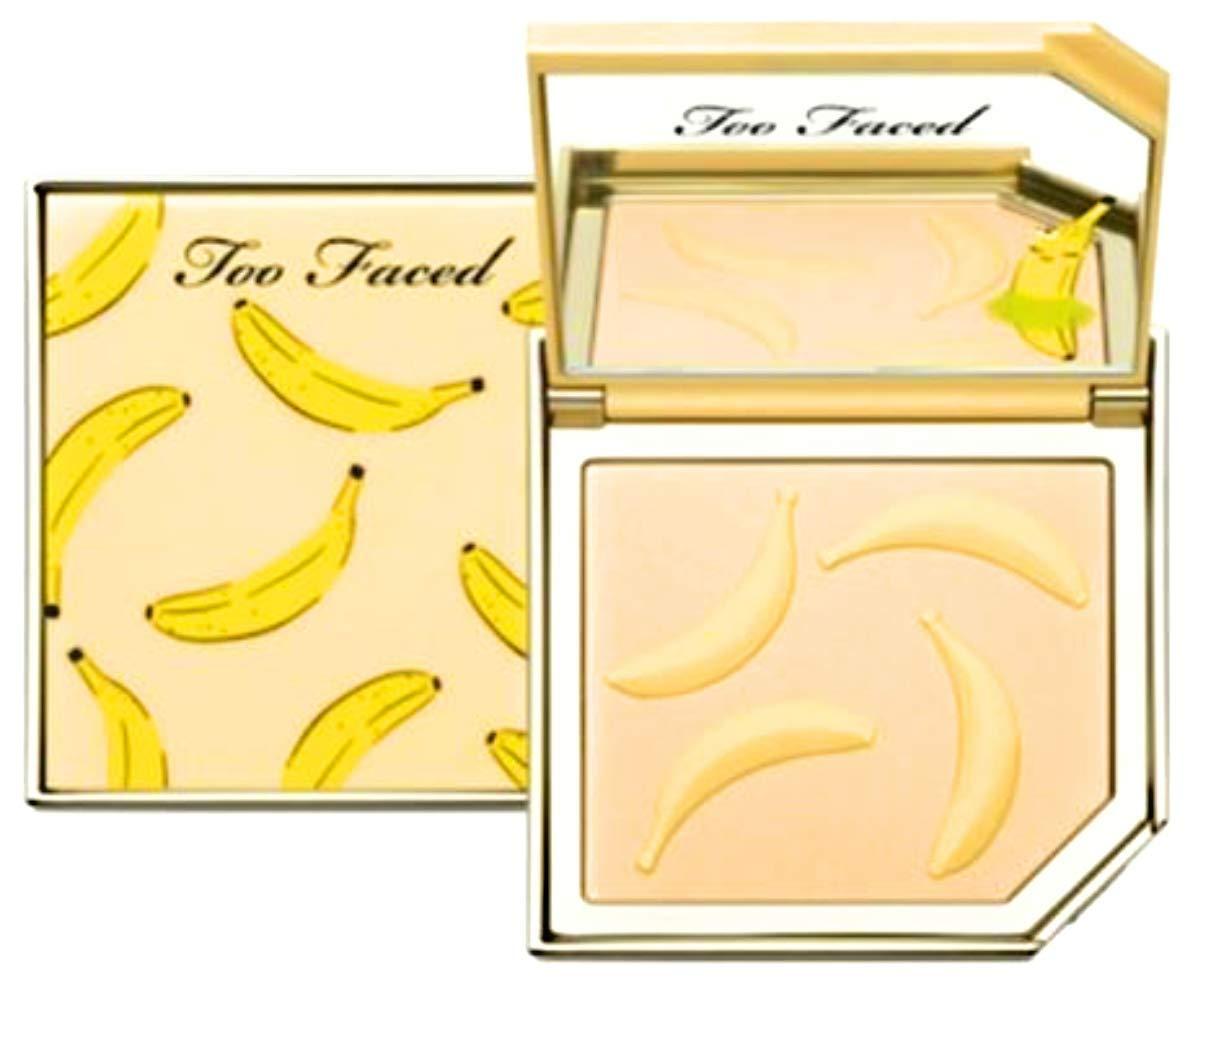 Too Faced Tutti Frutti It's Bananas Brightening Setting Powder